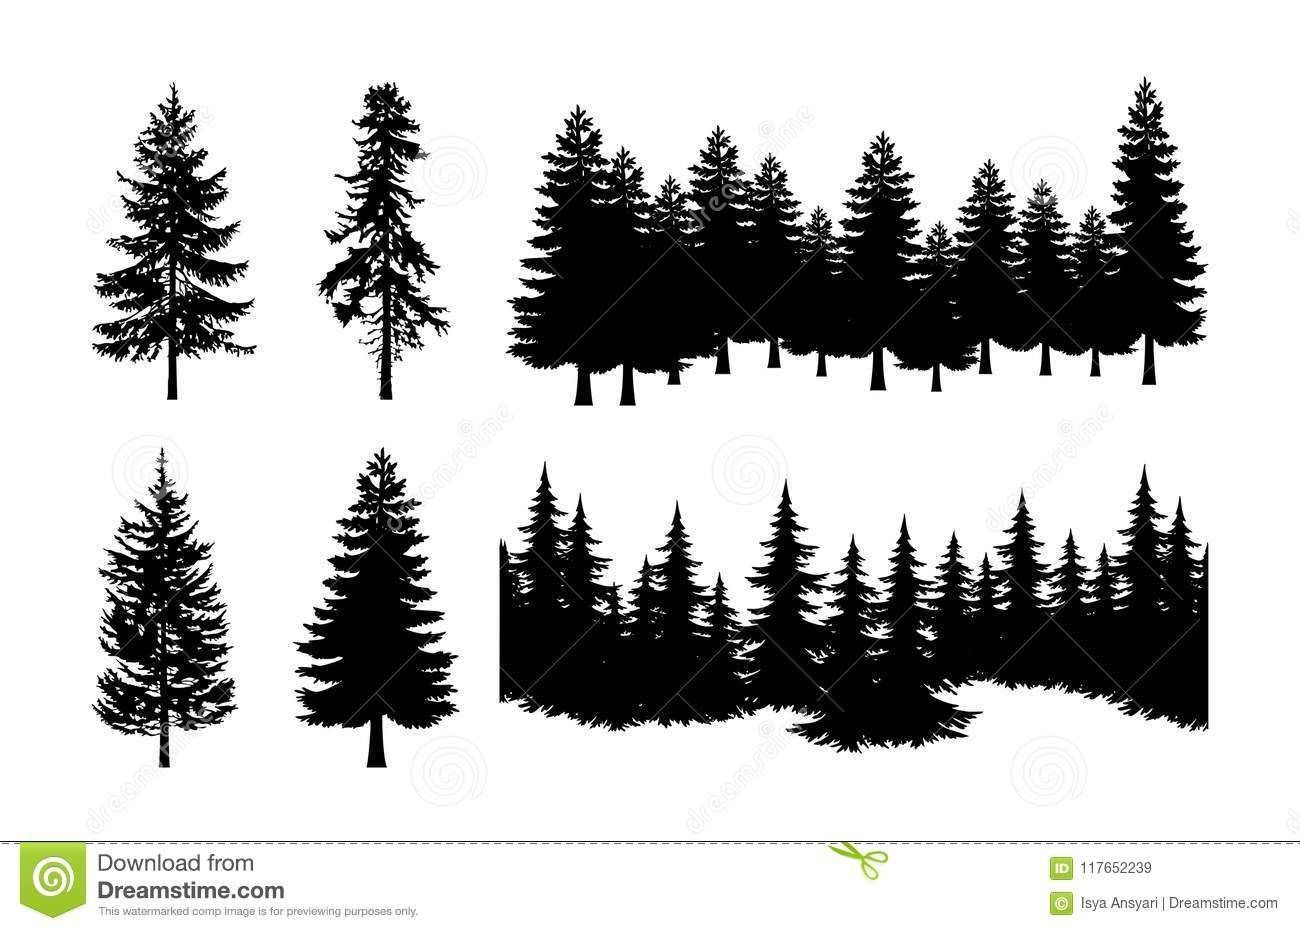 Illustration about Concept design a illustration vector of